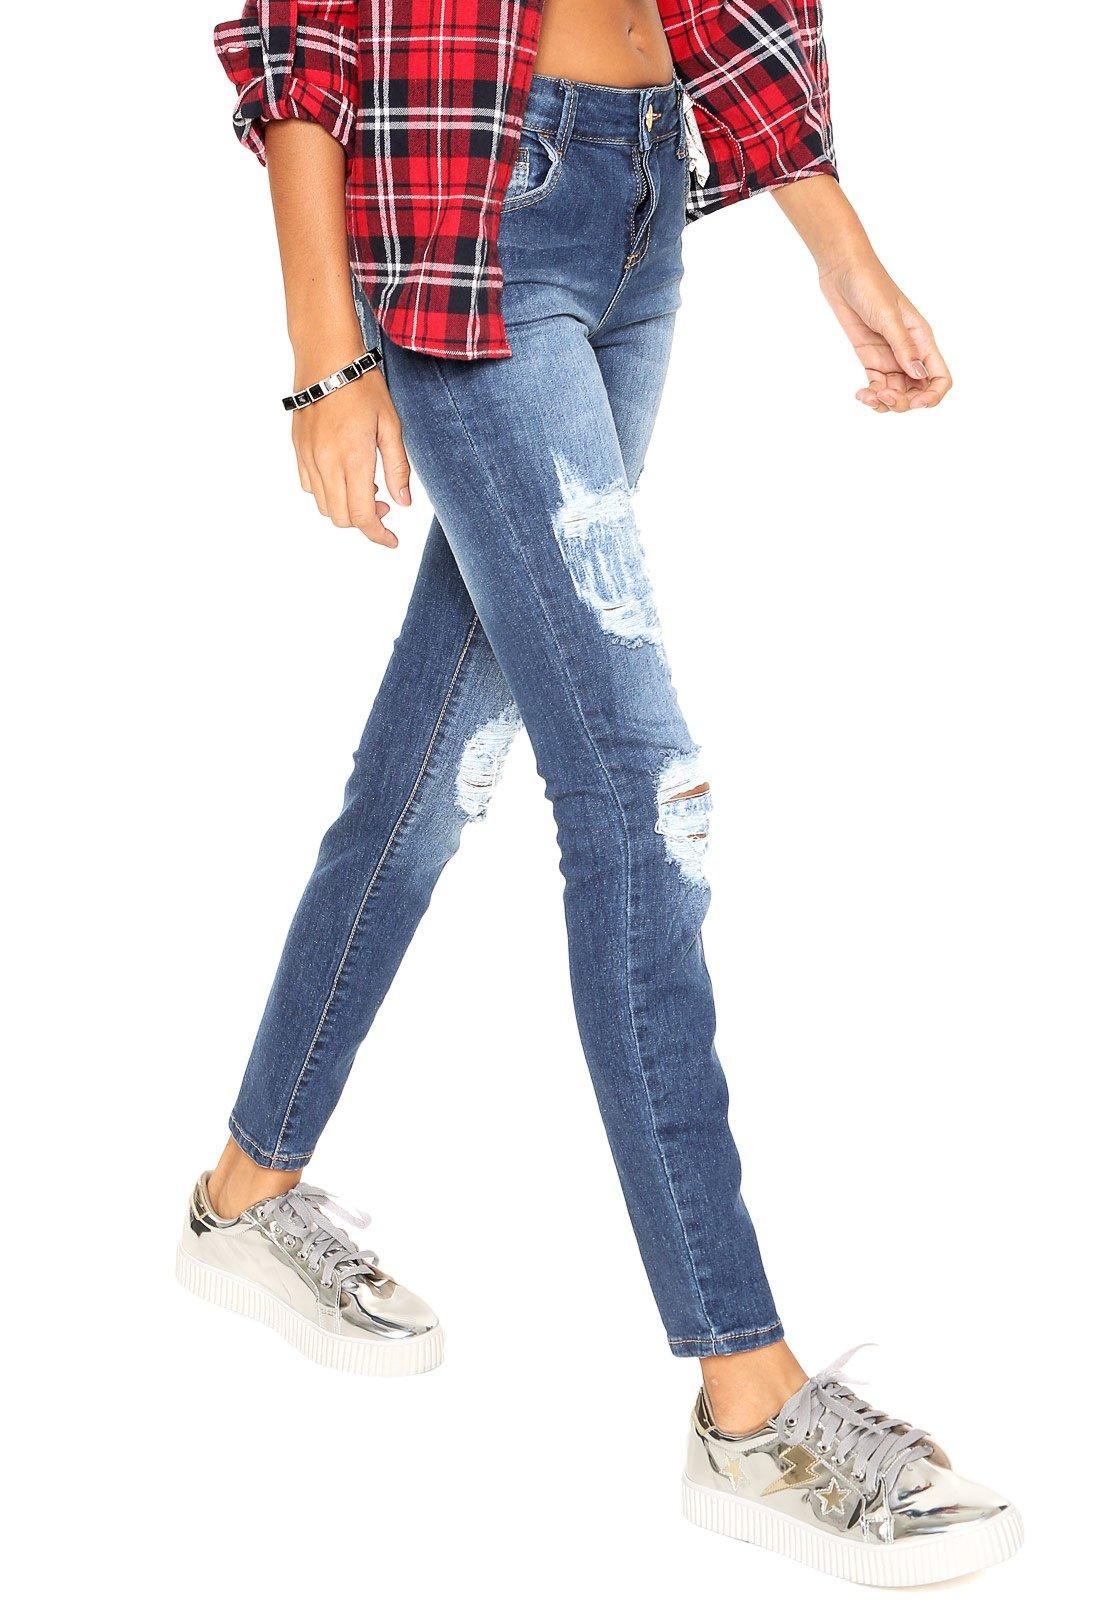 930b5ee7f Calça Jeans Coca-Cola Jeans Skinny Destroyed Azul - Marca Coca-Cola Jeans  ...